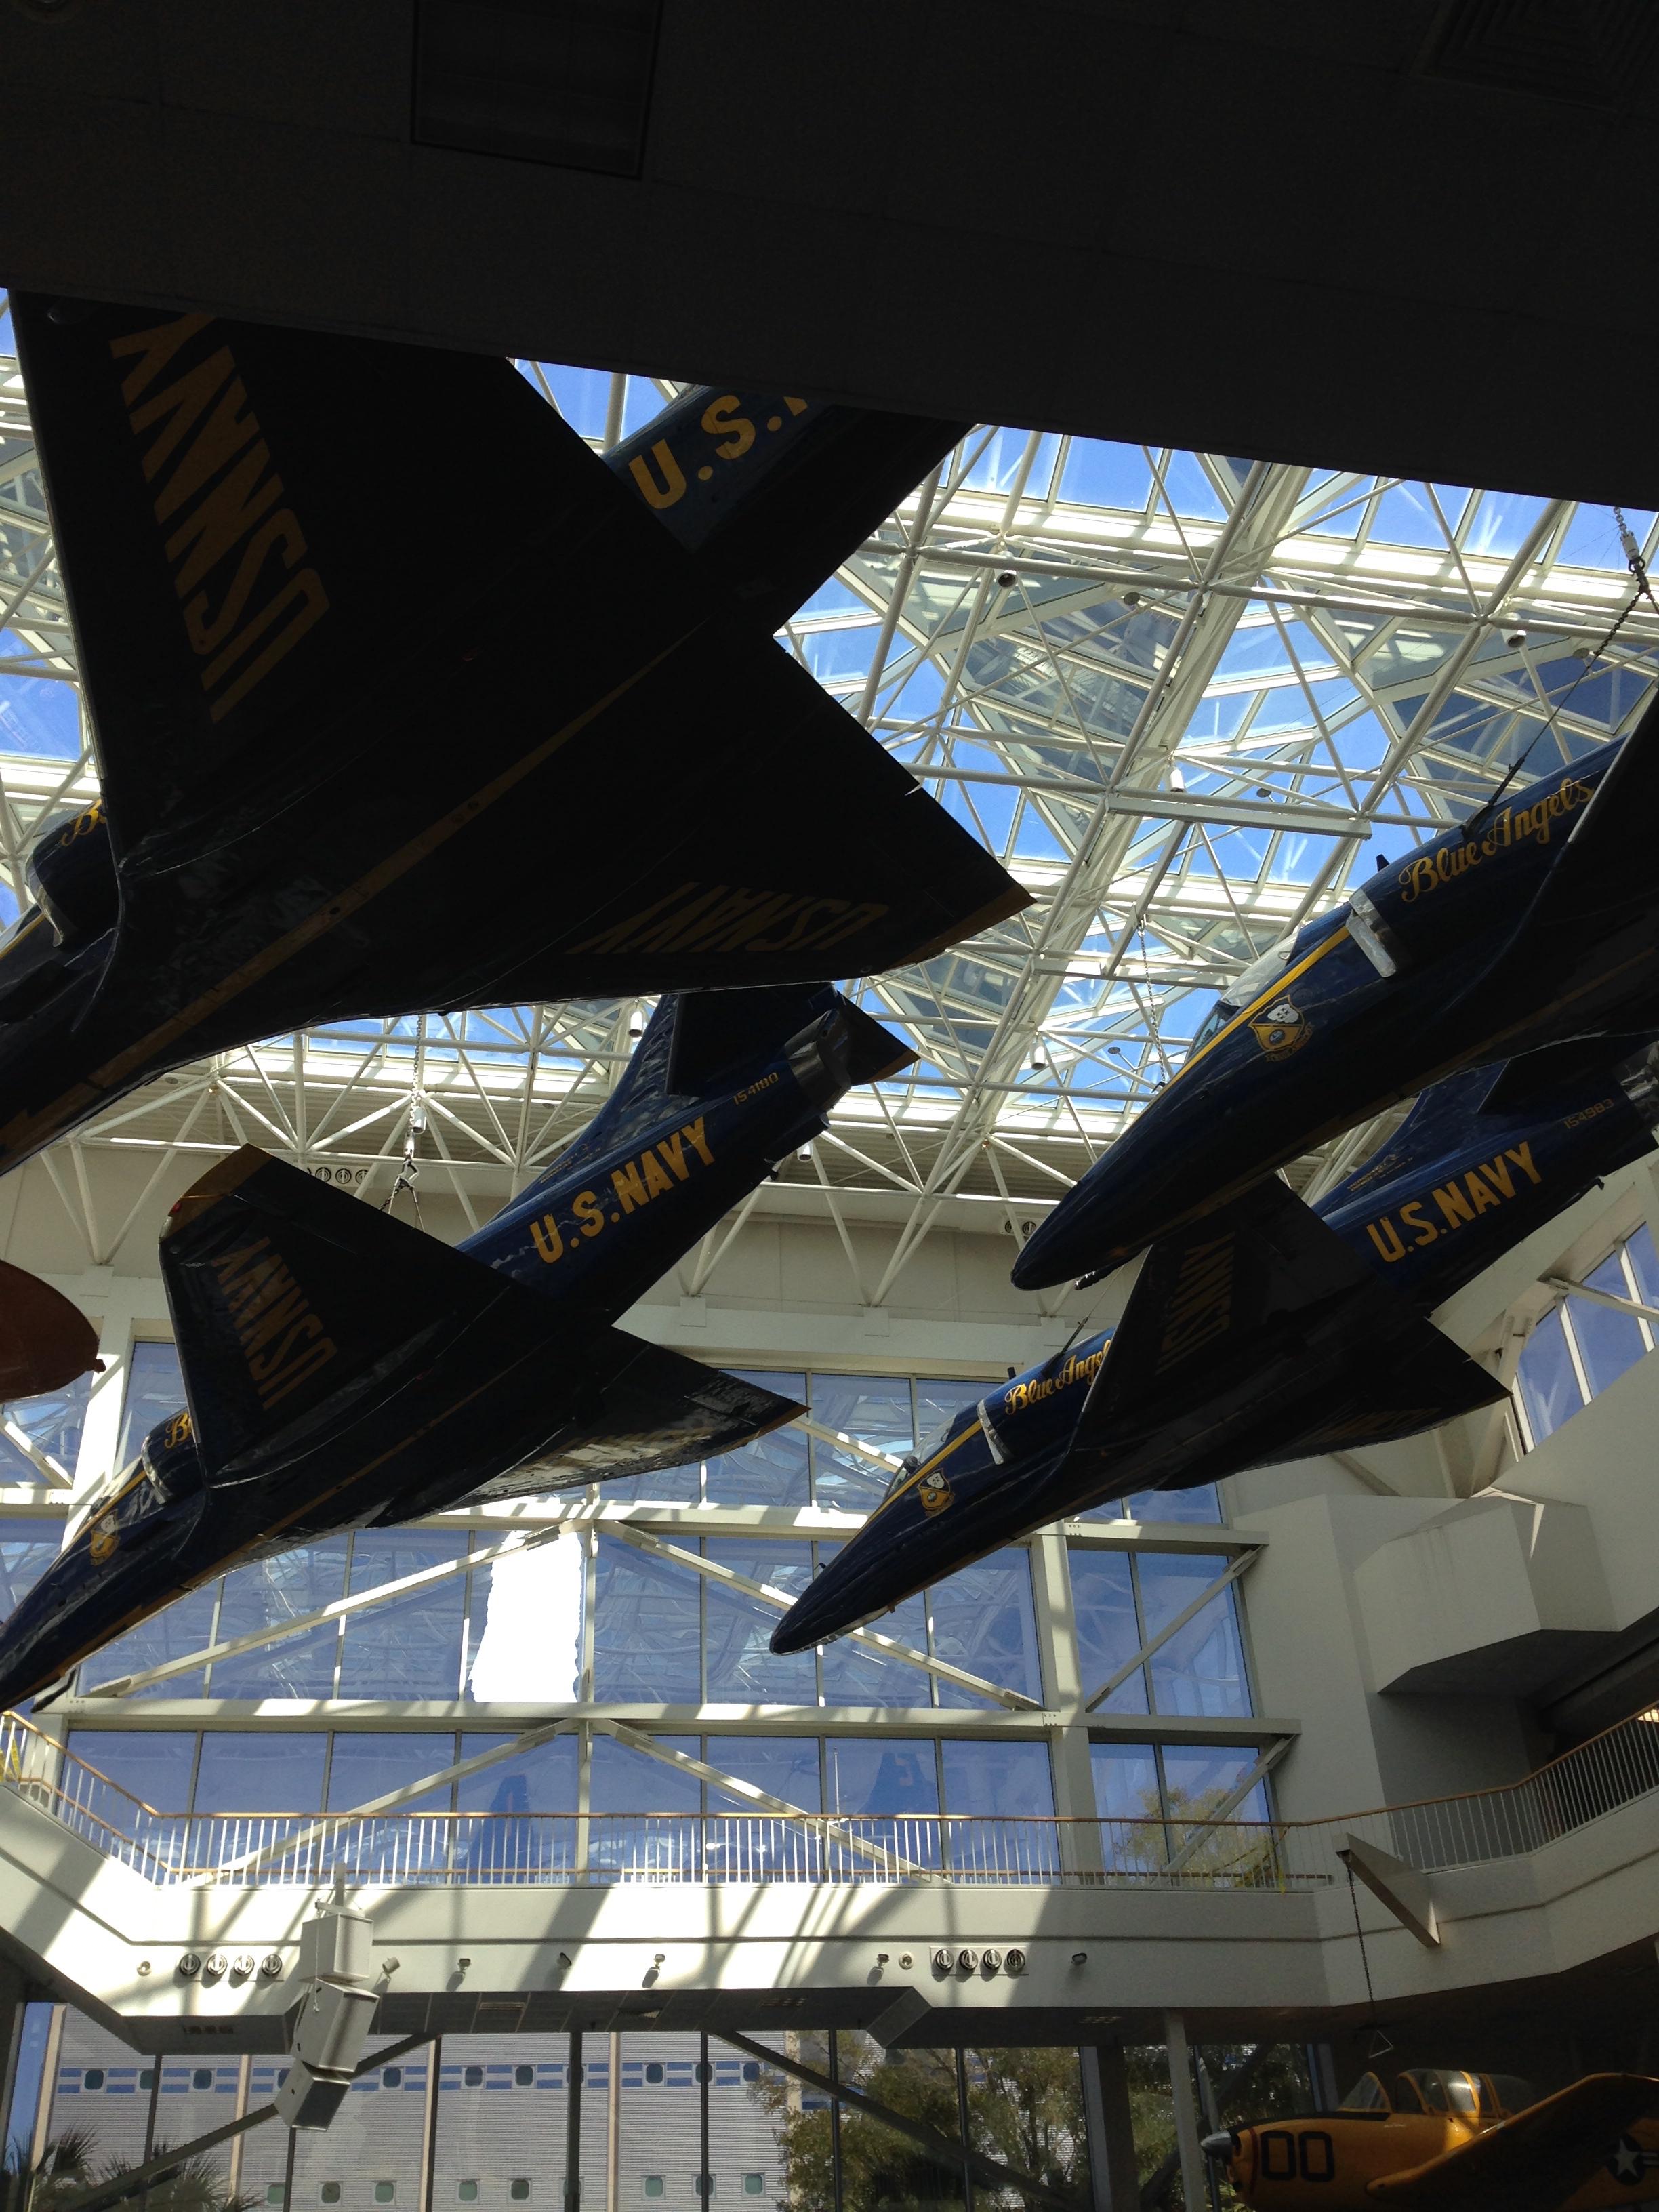 Blue Angels at the National Aviation Musuem at Pensacola Naval Air Station